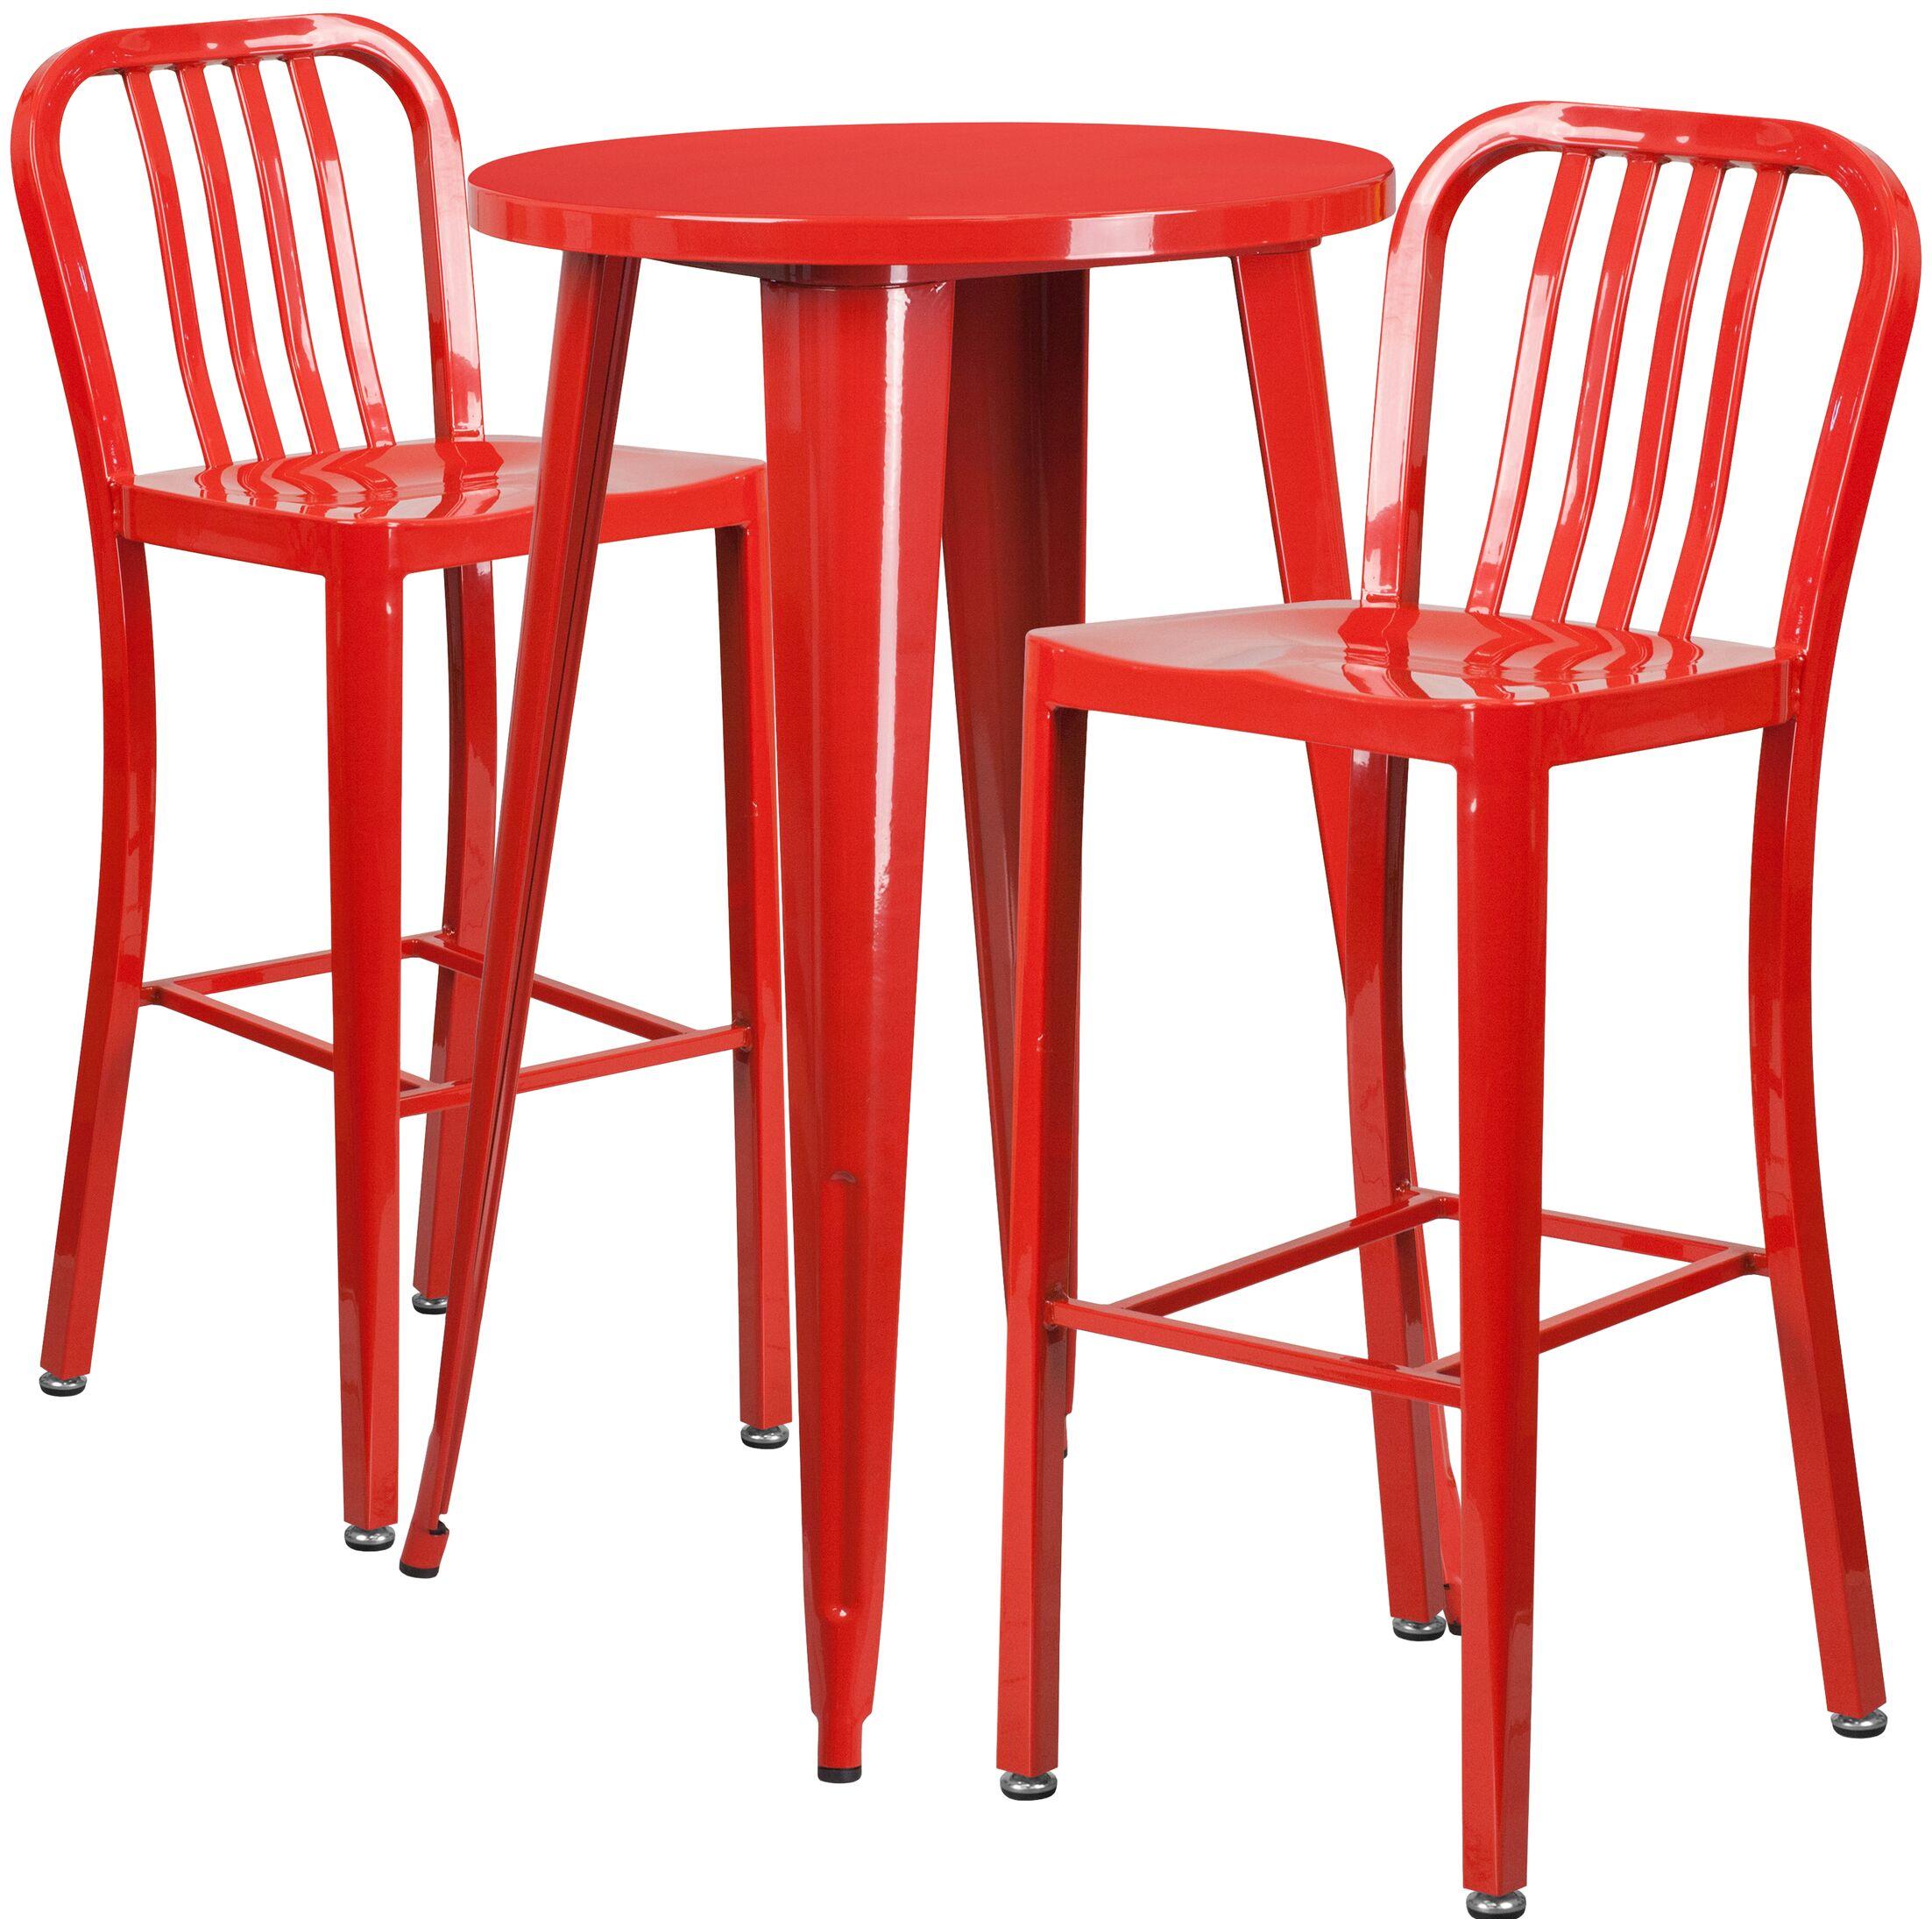 Sass 3 Piece Bar Height Dining Set Finish: Red